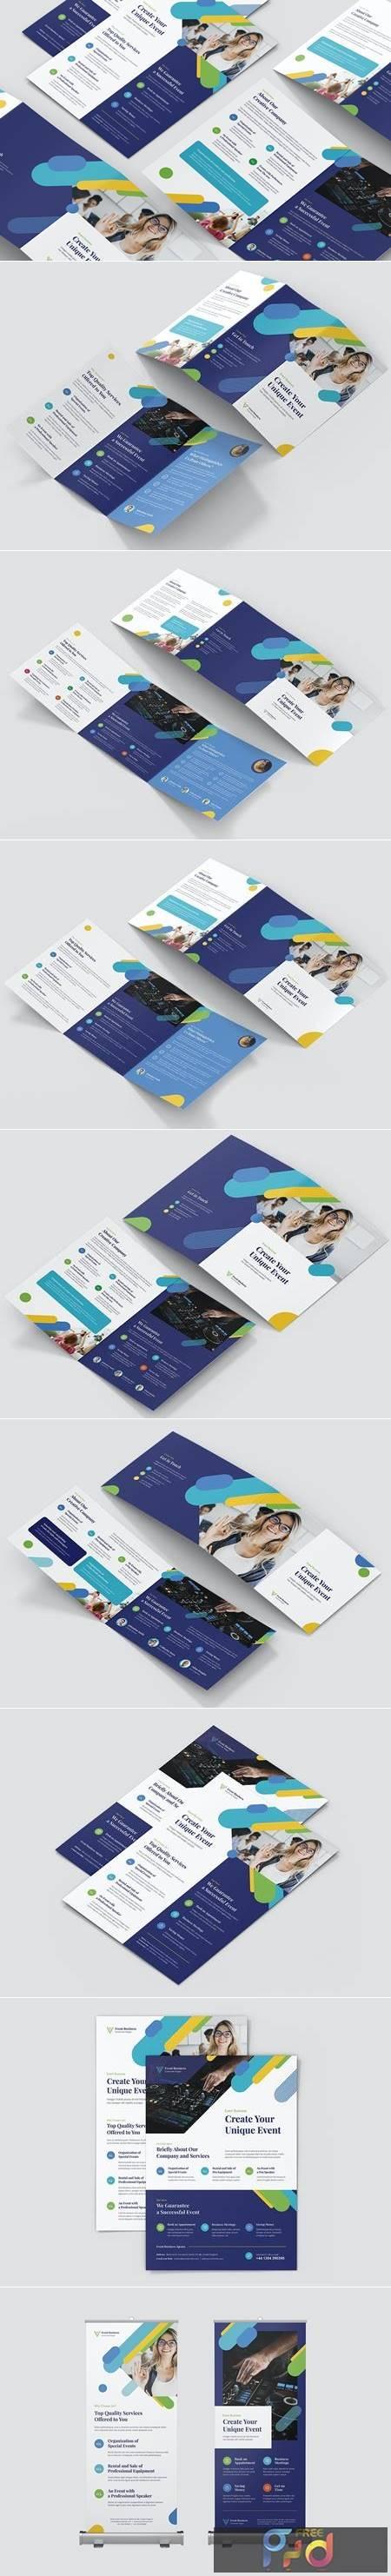 Event Business – Brochures Bundle Print Templates 22G42YT 1